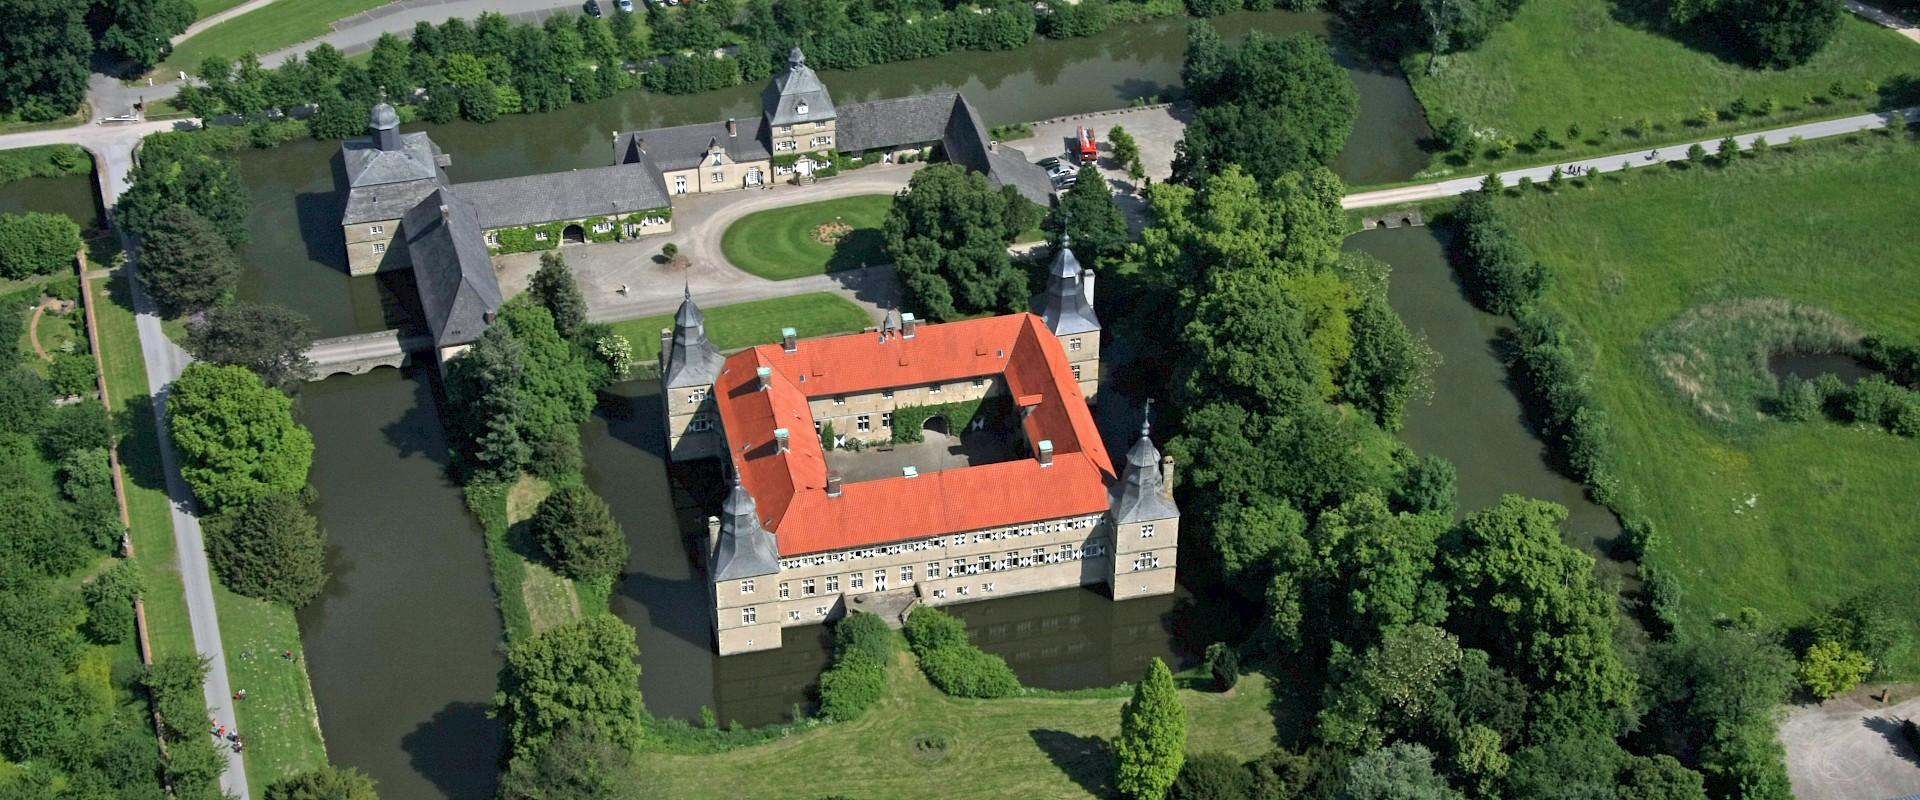 Schloss Westerwinkel 100 Schlösser Route